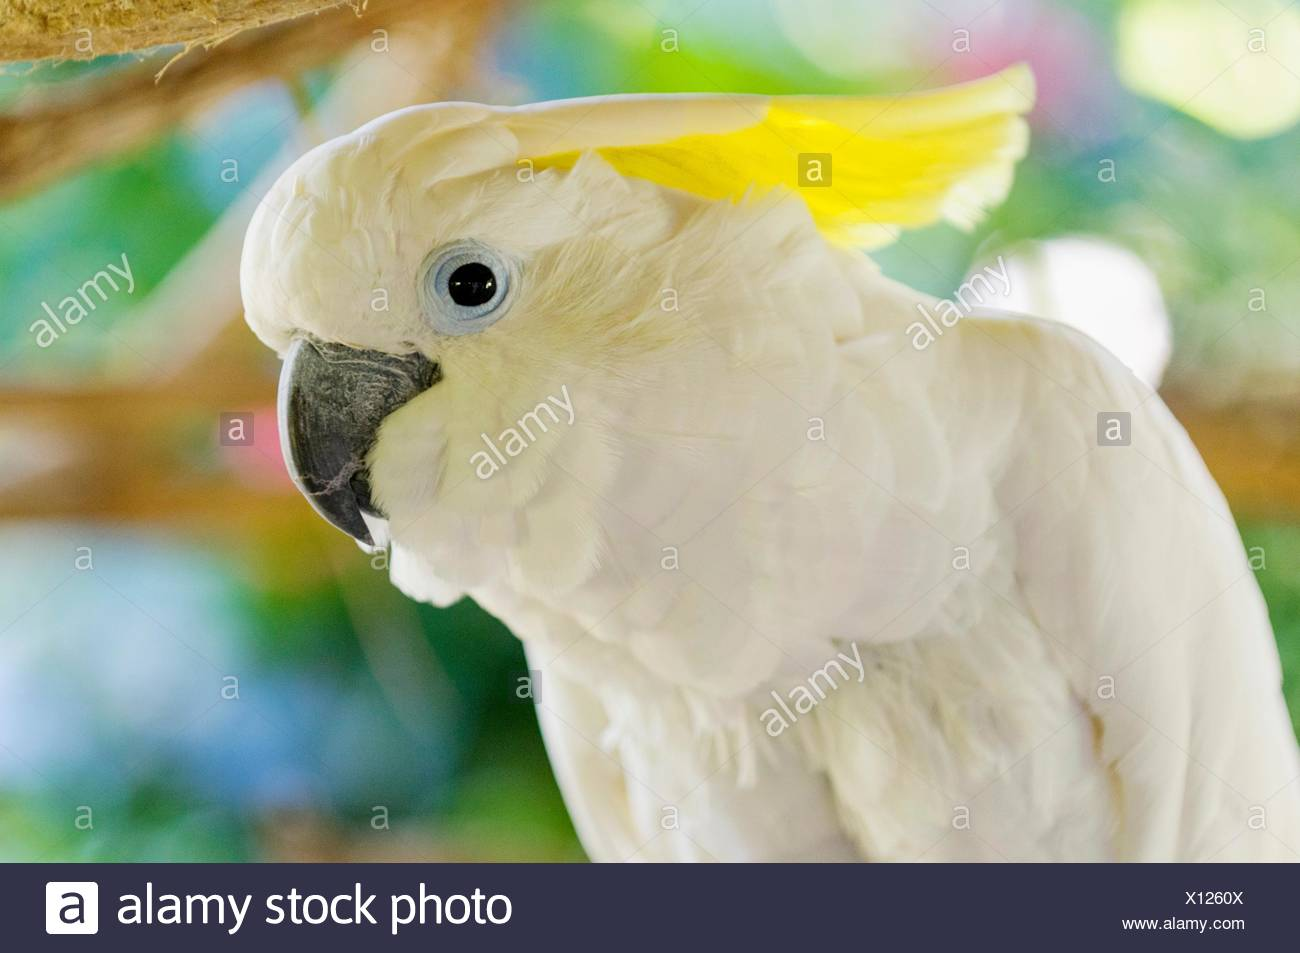 white cockatoo (Cacatua alba), Park, Villahermosa, Tabasco, Mexico, America - Stock Image